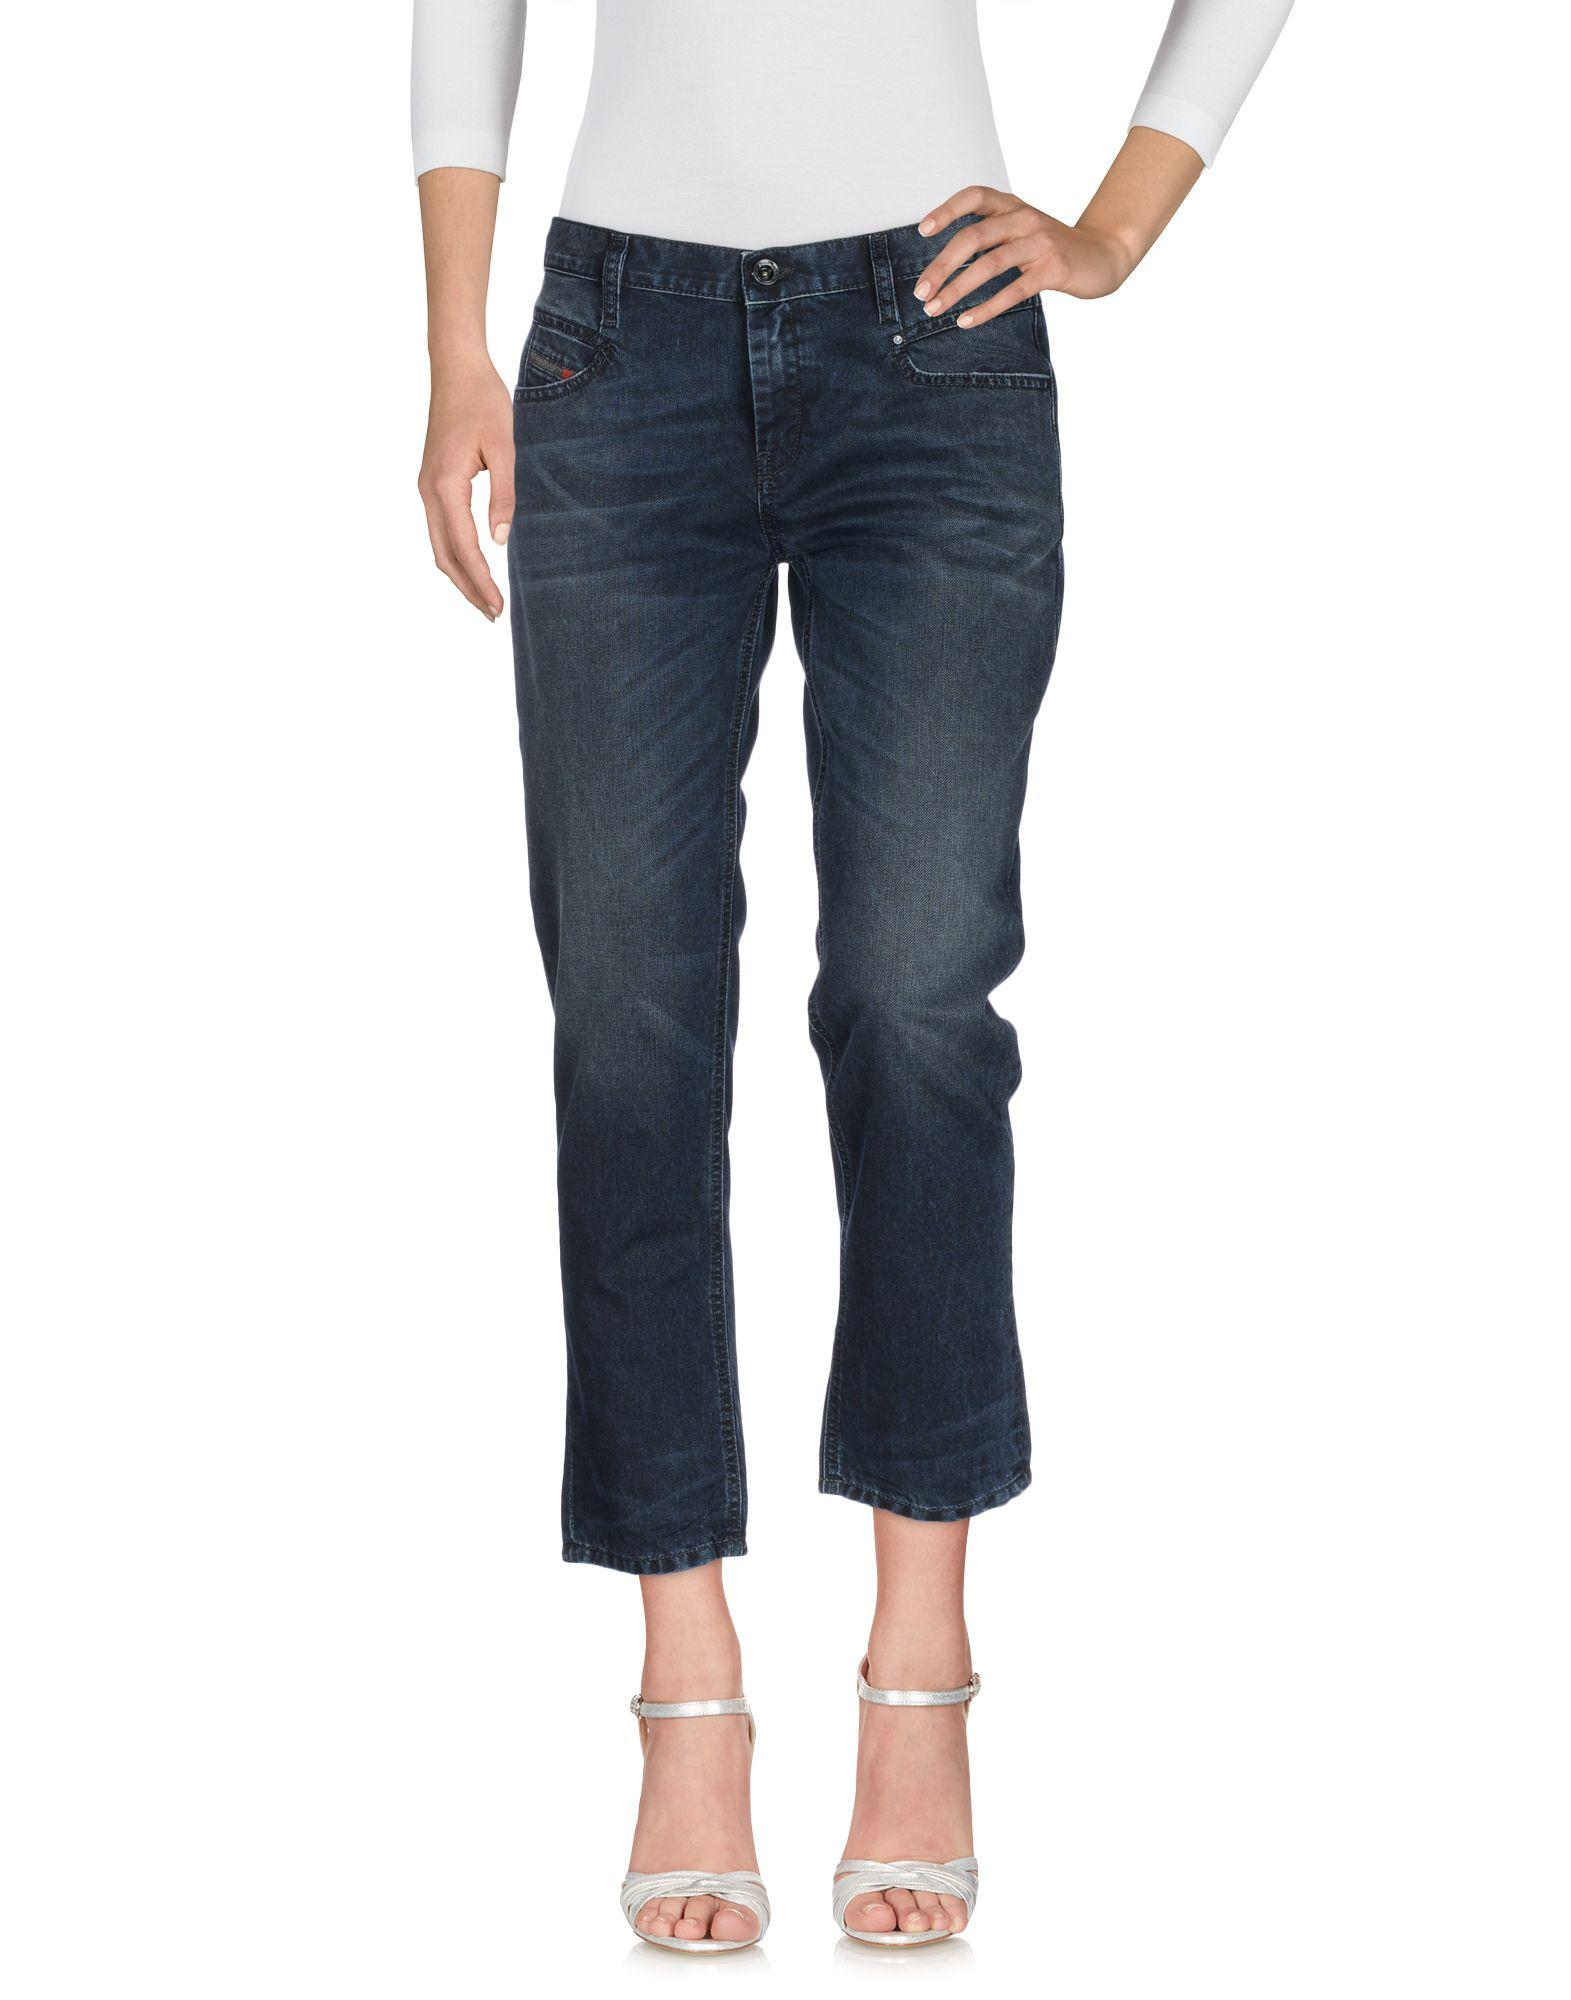 Pantaloni Jeans Diesel Donna - Acquista online su z3gRDsXP